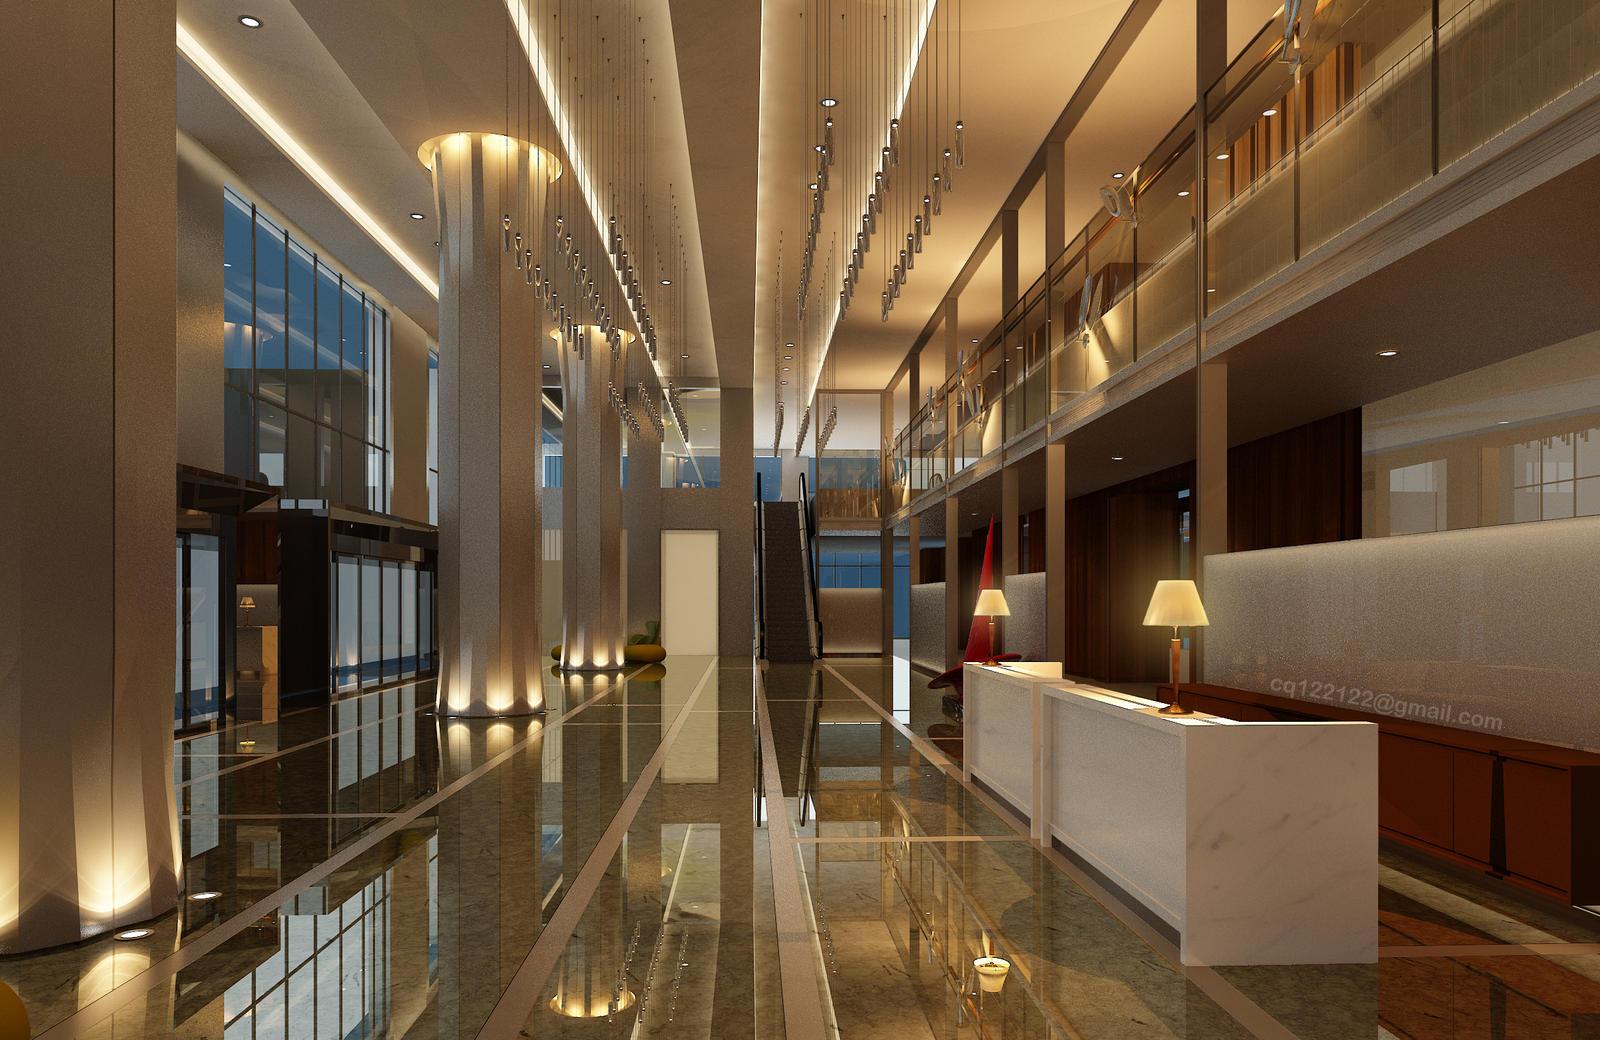 Hotel Lobby Design Night by DouglasDao on DeviantArt